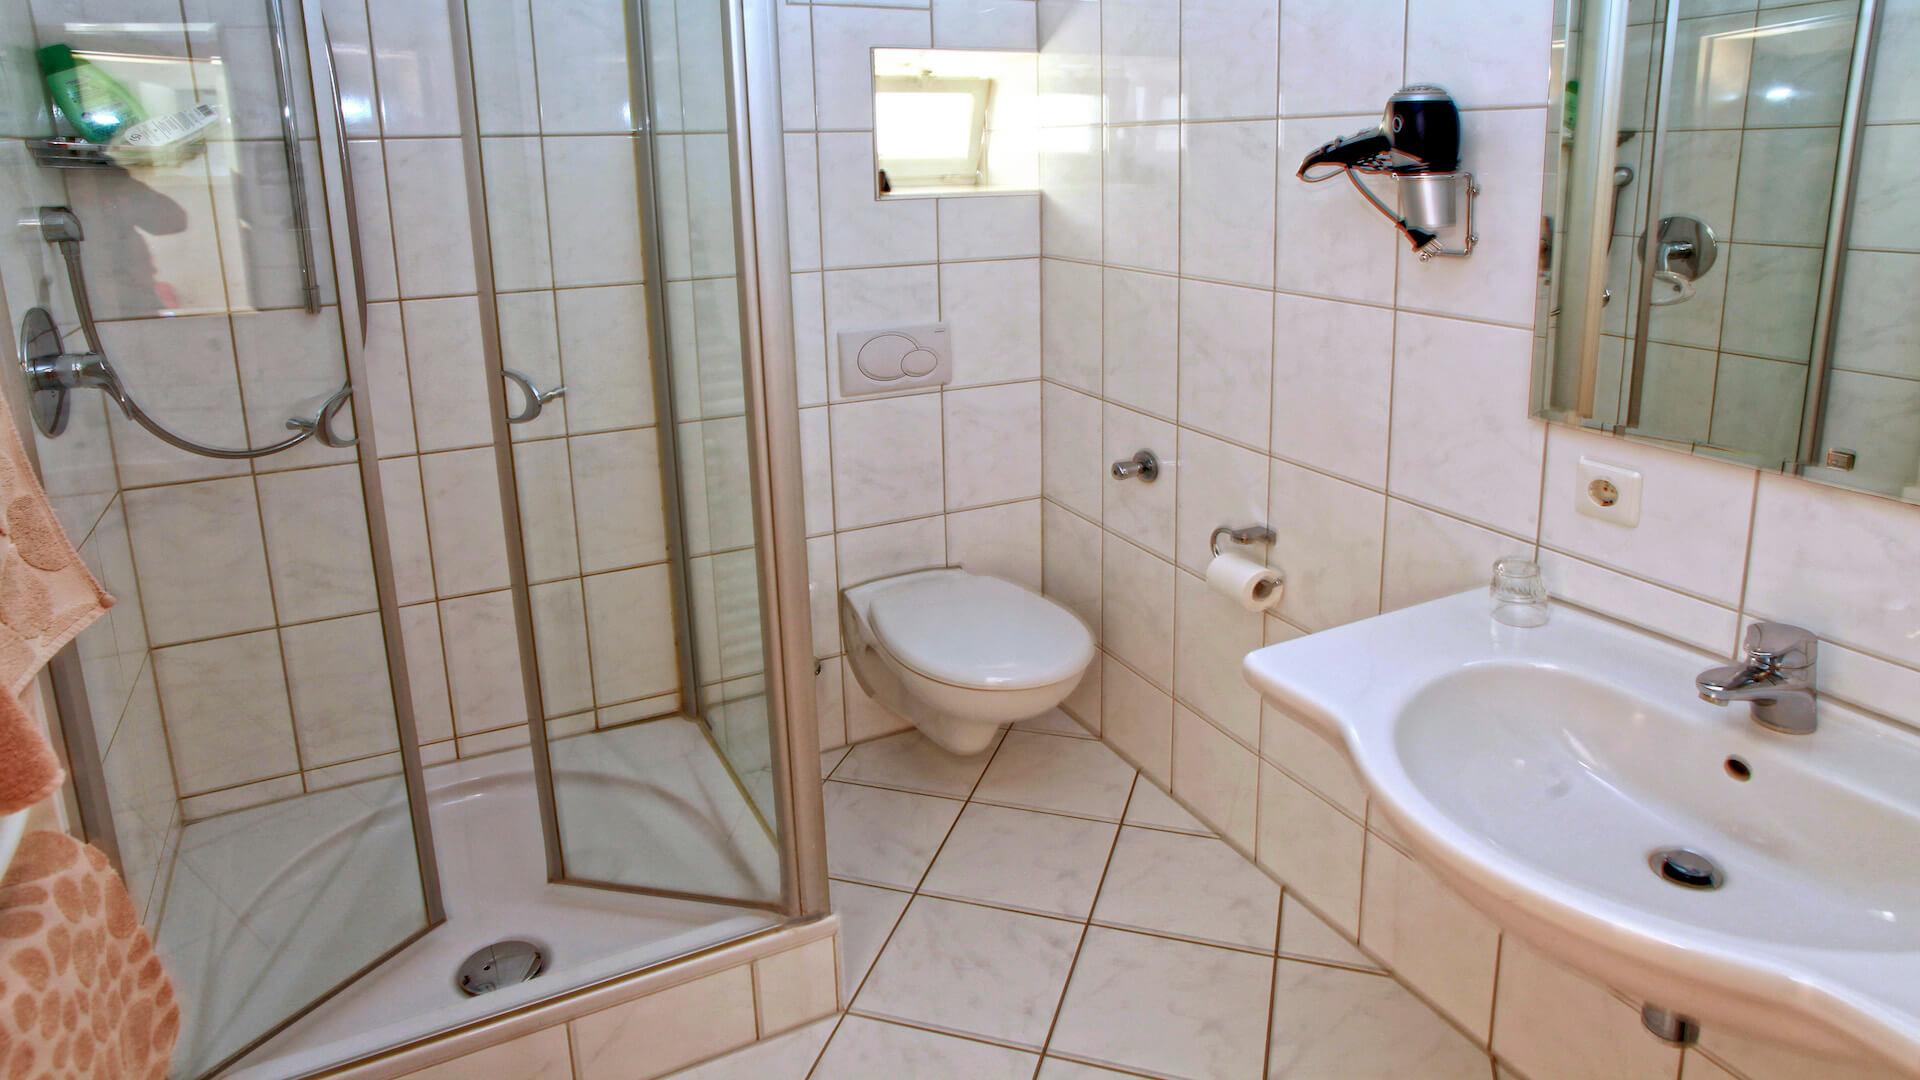 Dusche | Hotel-Gasthof Schiff - Horb am Neckar